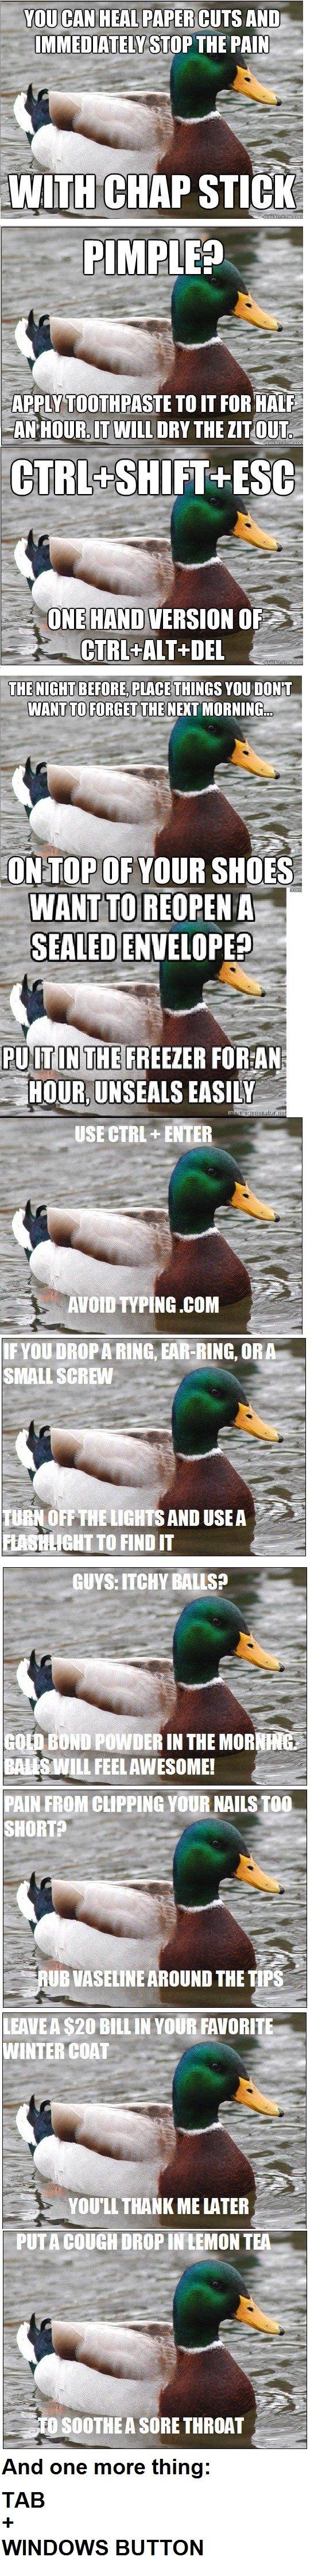 Good Advice Duck Comp. one two three four five by the way I meant windows plus tab. sri/ ici/ iii: rri' iip nai) VIII! M if UH Ni Emu Blurs I; IPI' Illa Yuk NAI